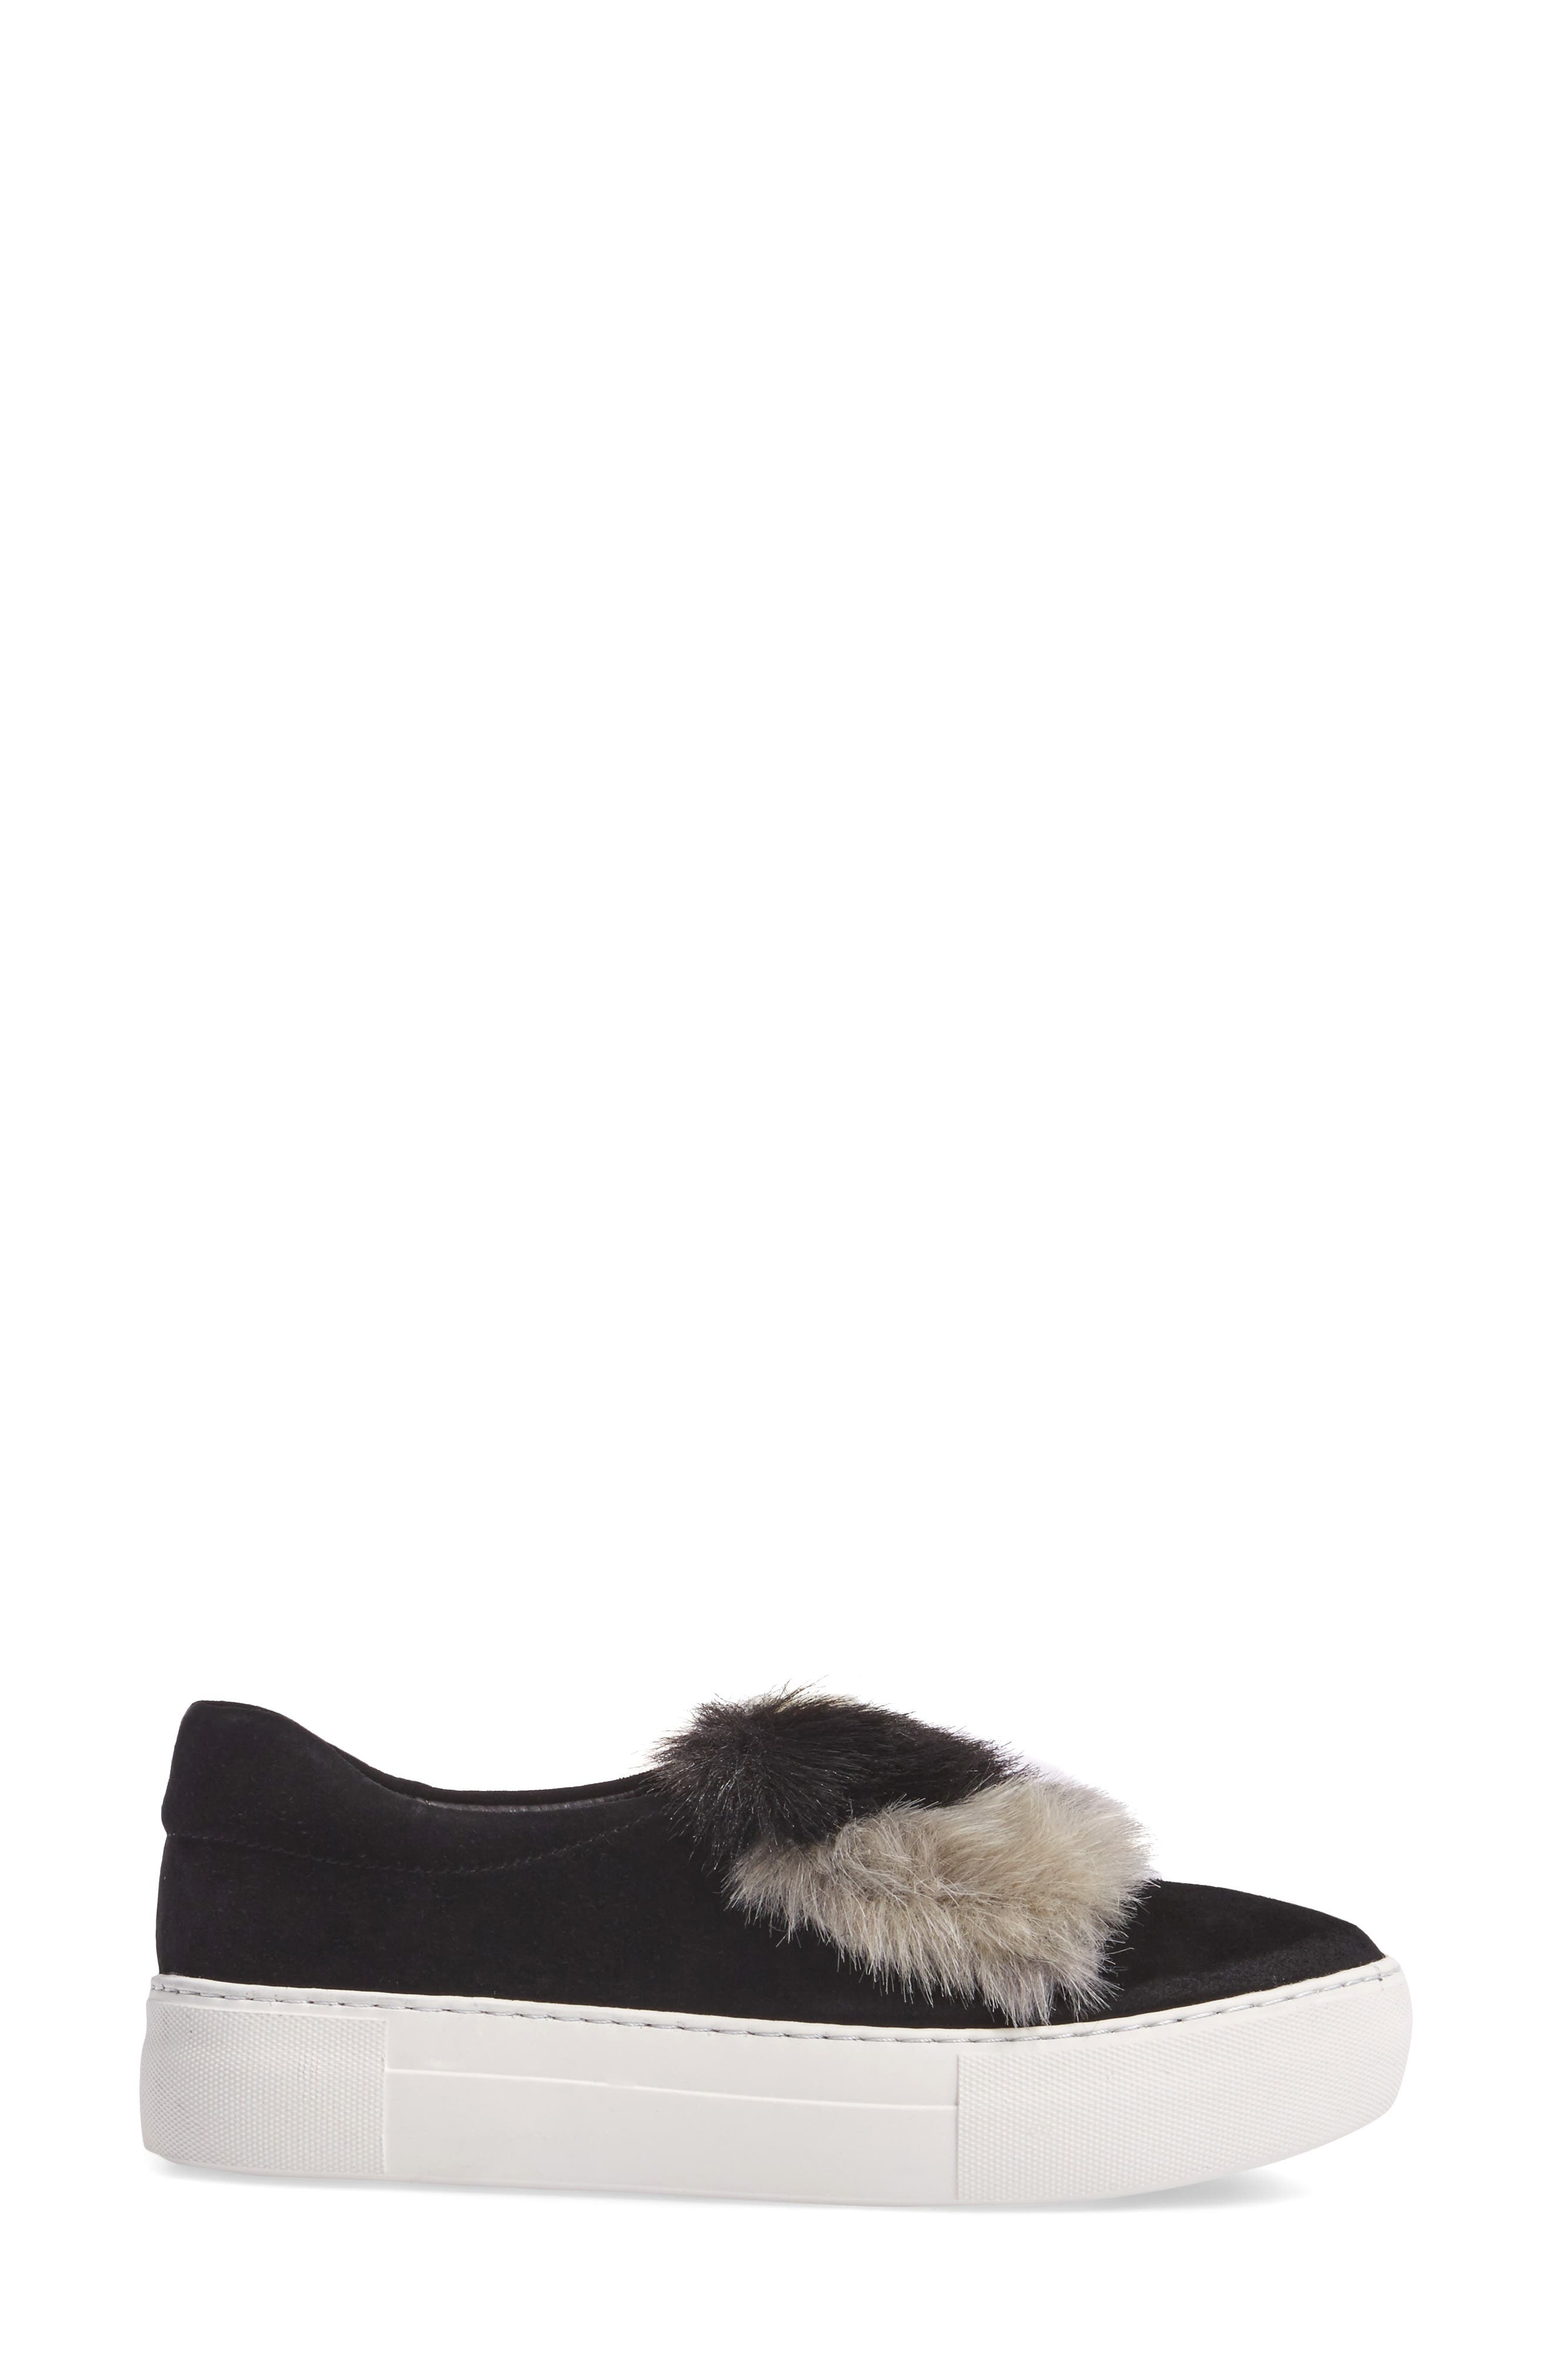 JSLIDES,                             Alexi Faux Fur Slip-On Sneaker,                             Alternate thumbnail 3, color,                             002